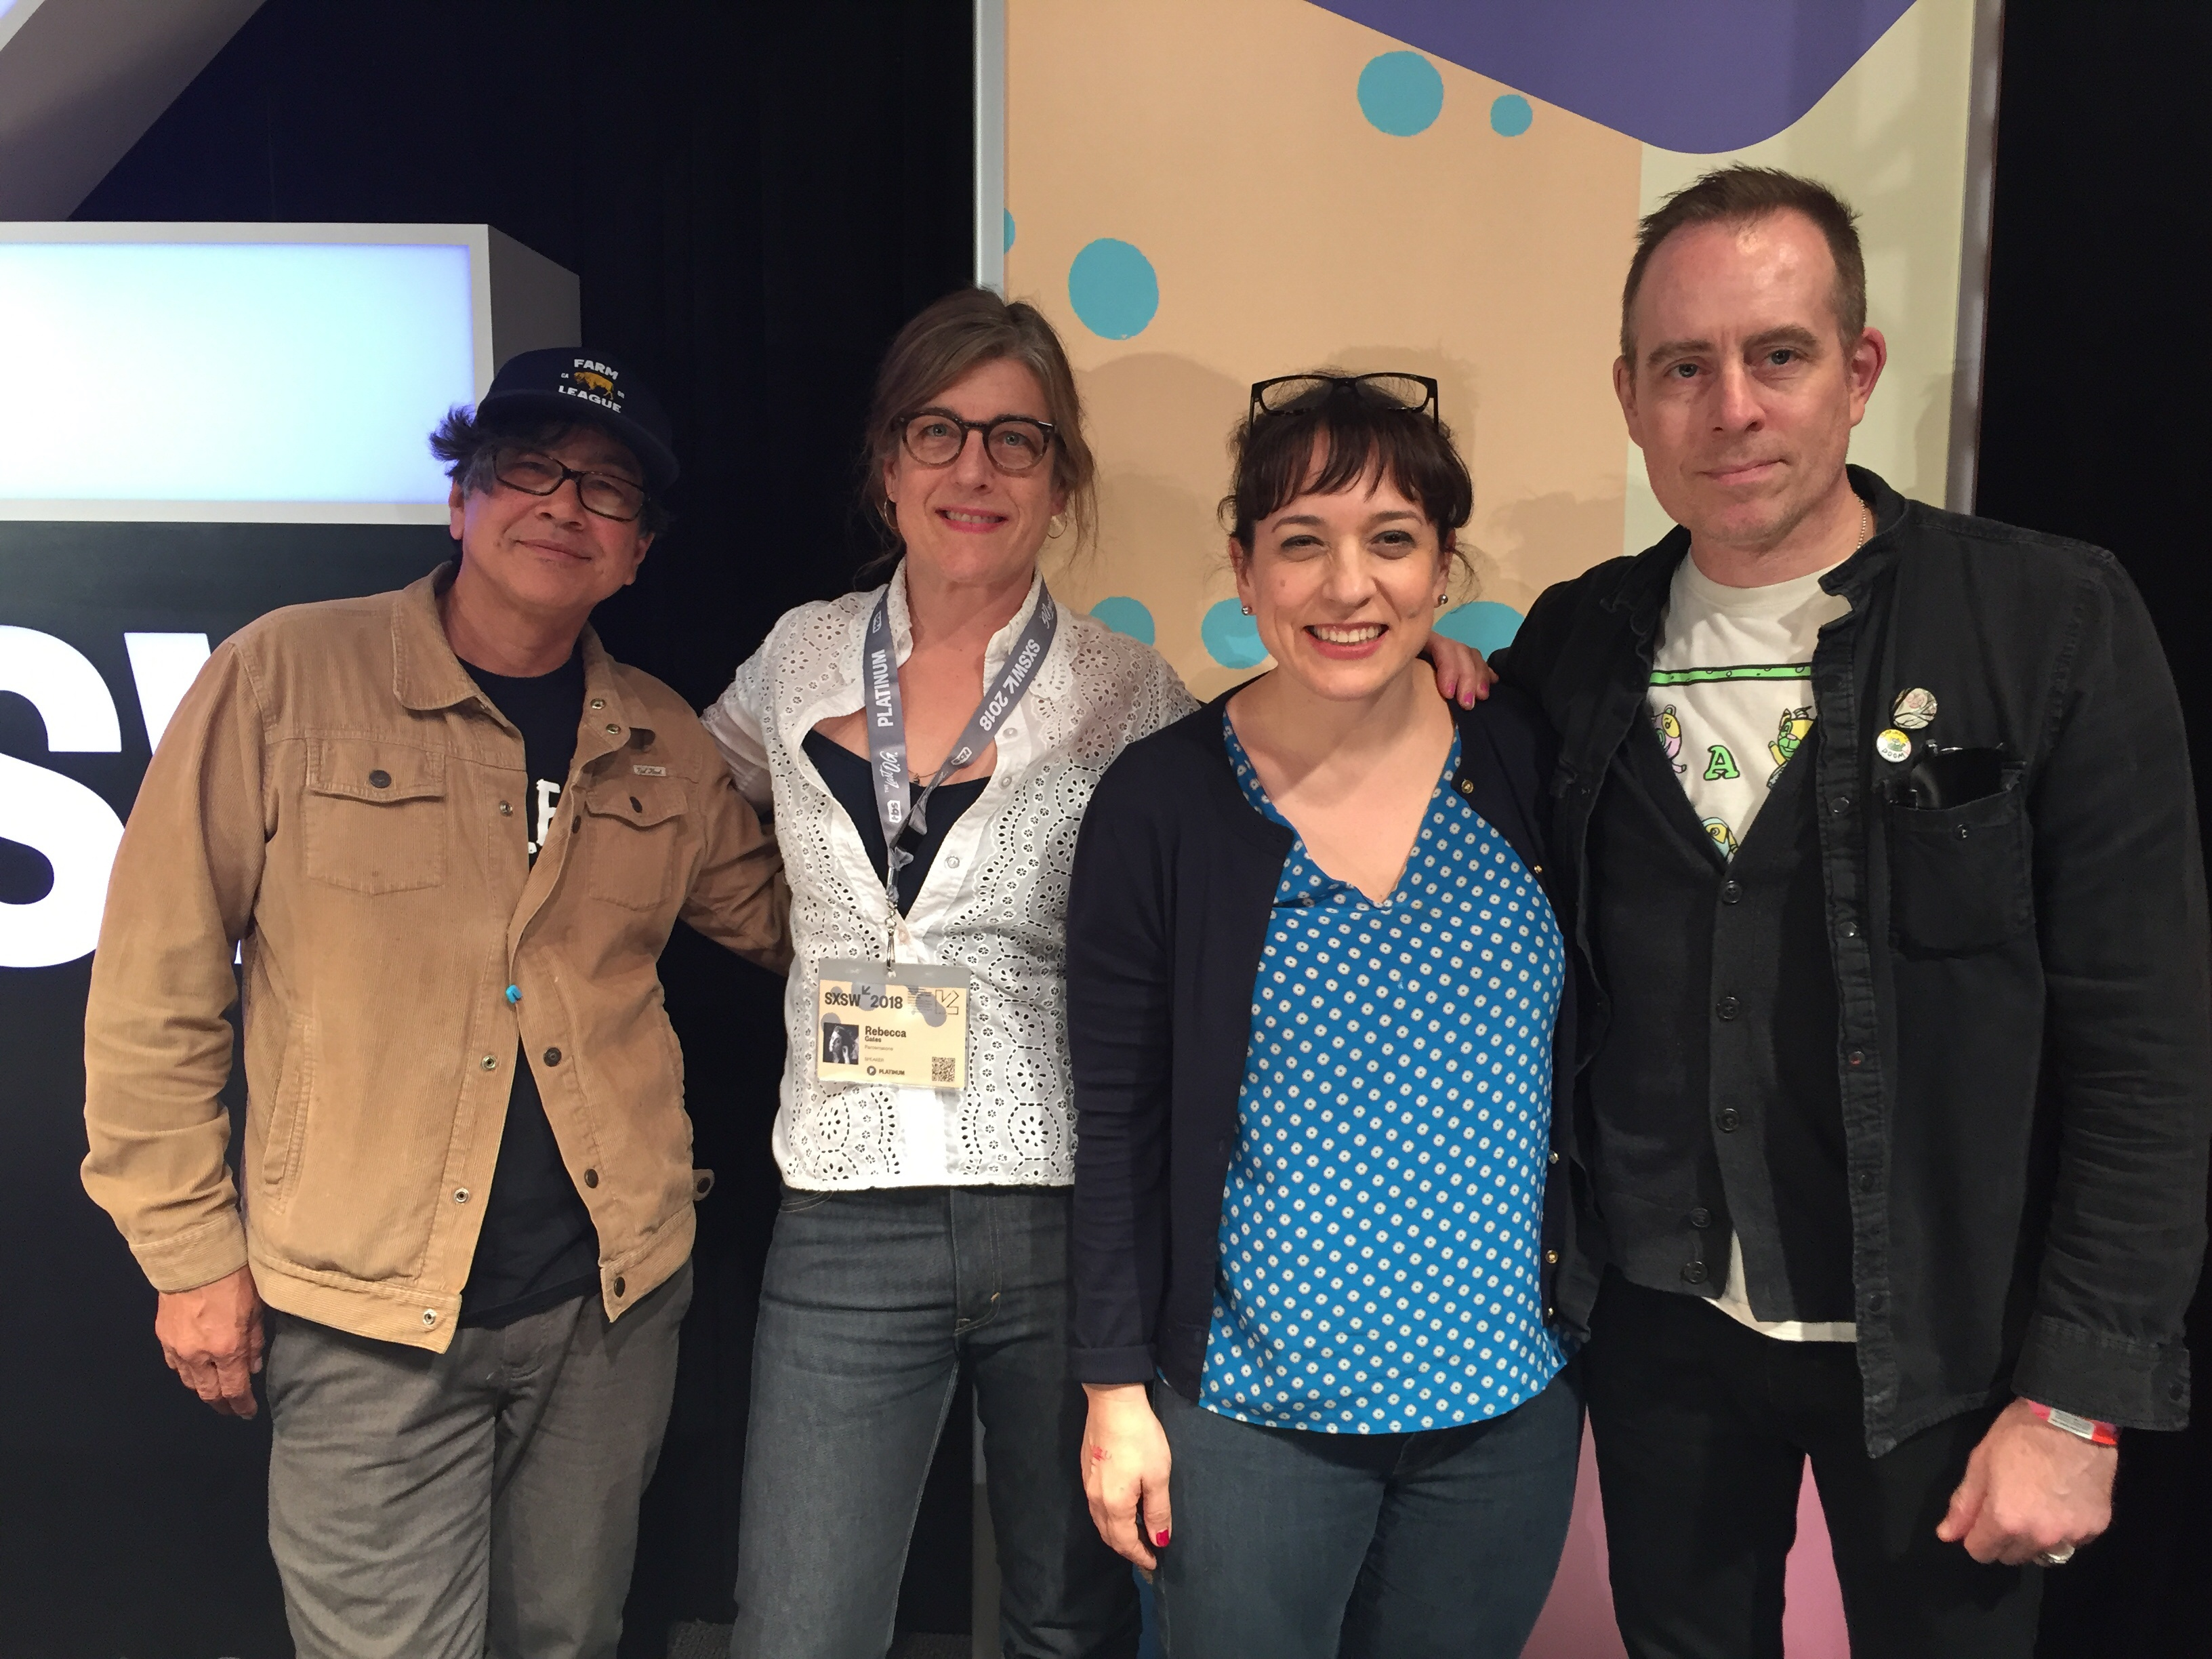 Ted Leo, Rebecca Gates, Molly Neuman, and Money Mark at SXSW